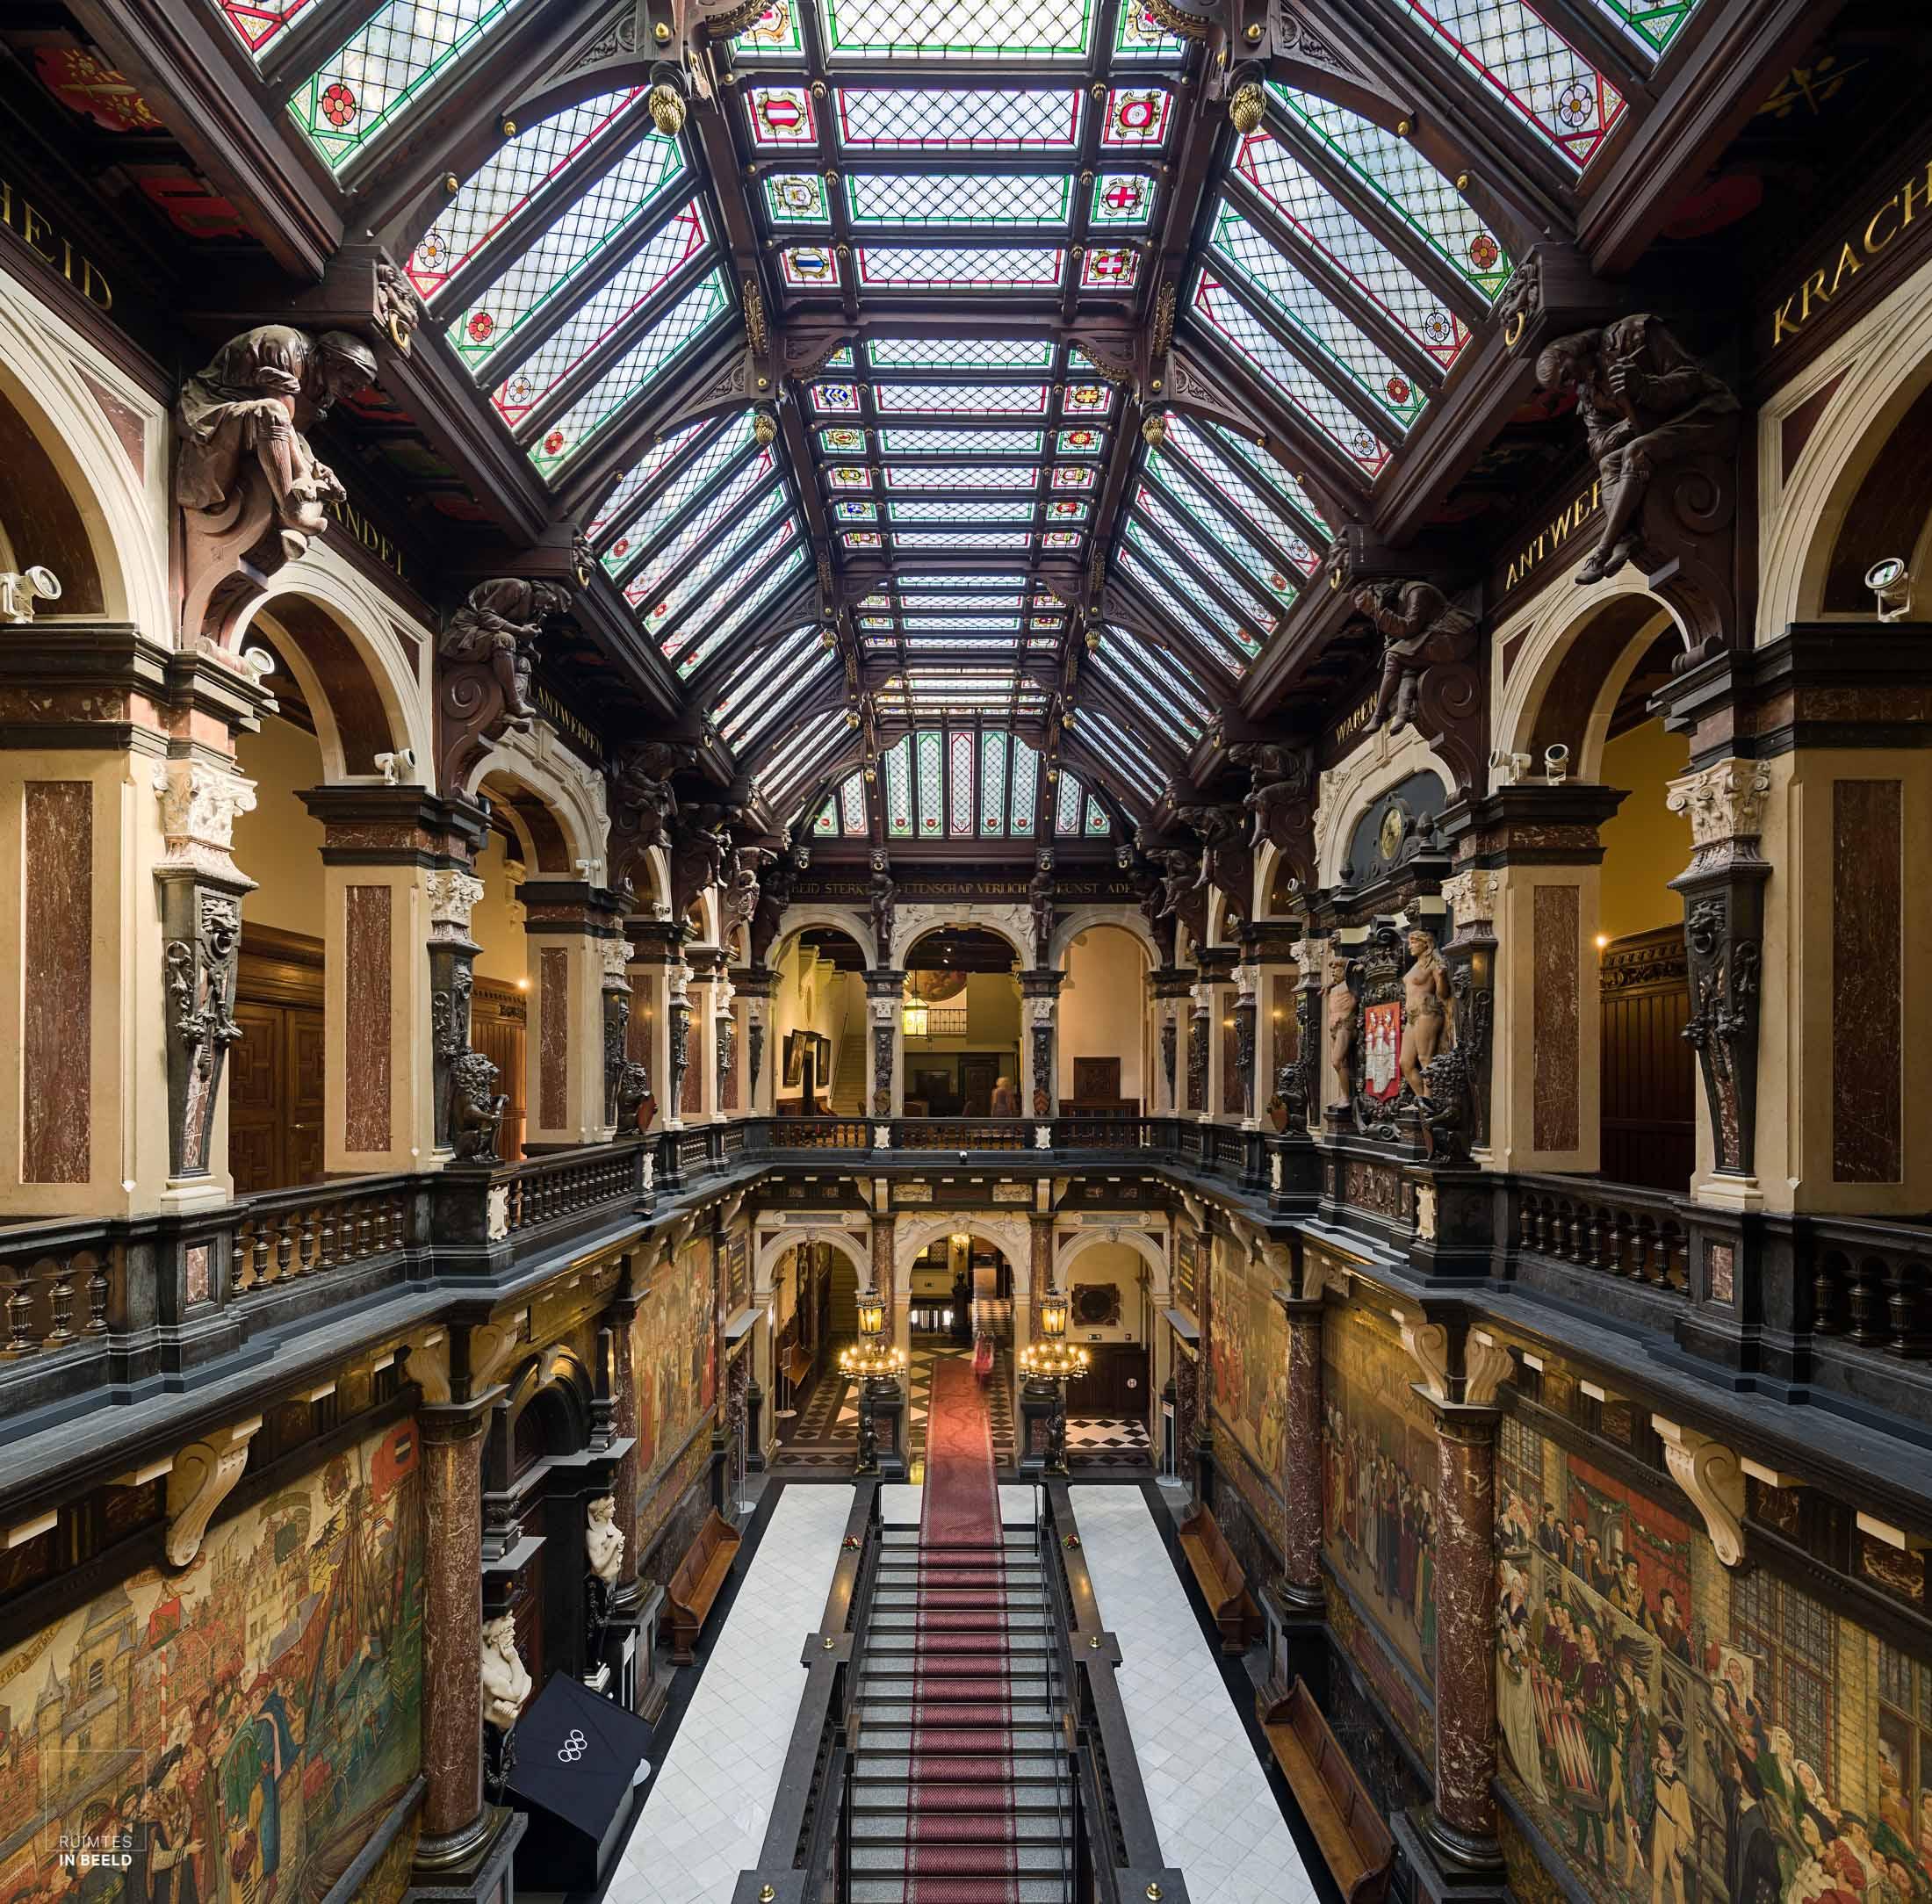 Hal in stadhuis van Antwerpen | Main hall in Antwerp city hall